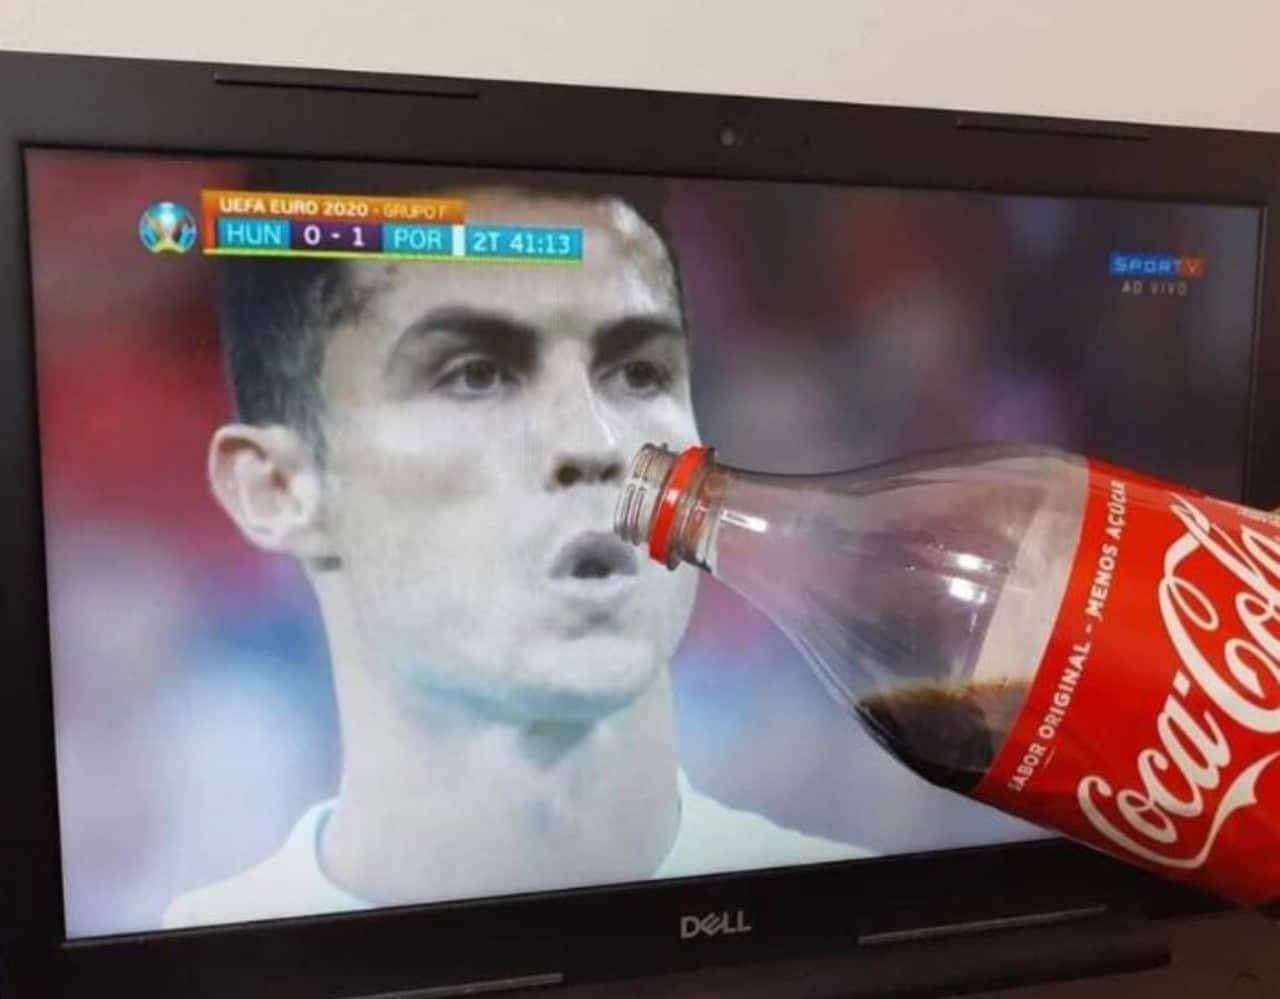 Meme Cristiano Ronaldo tomando Coca Cola